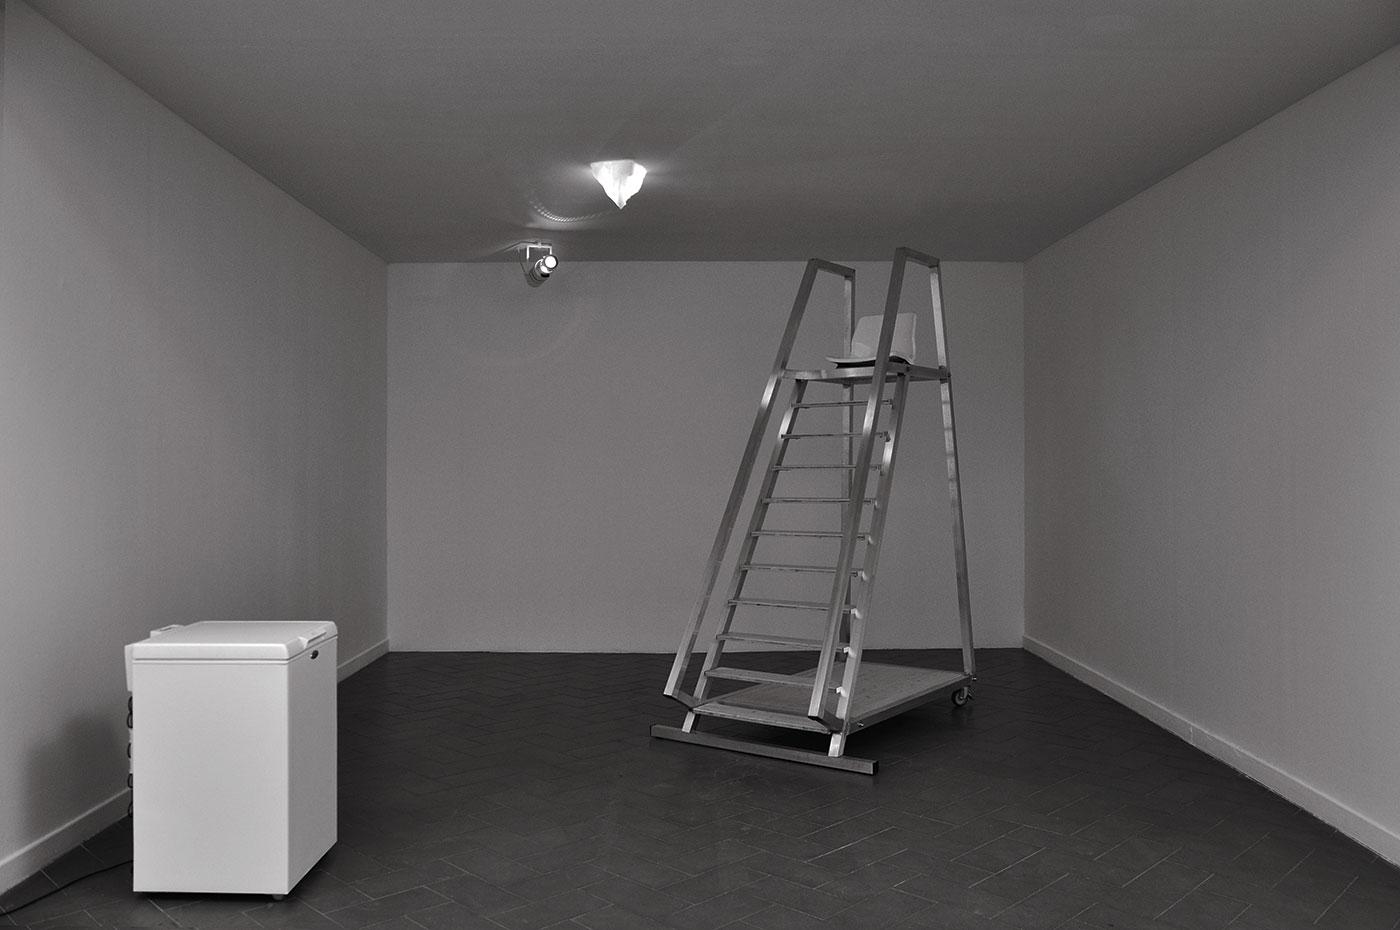 iceberg in ice, light projector, alluminium ladder and wooden, freezer box. 2010